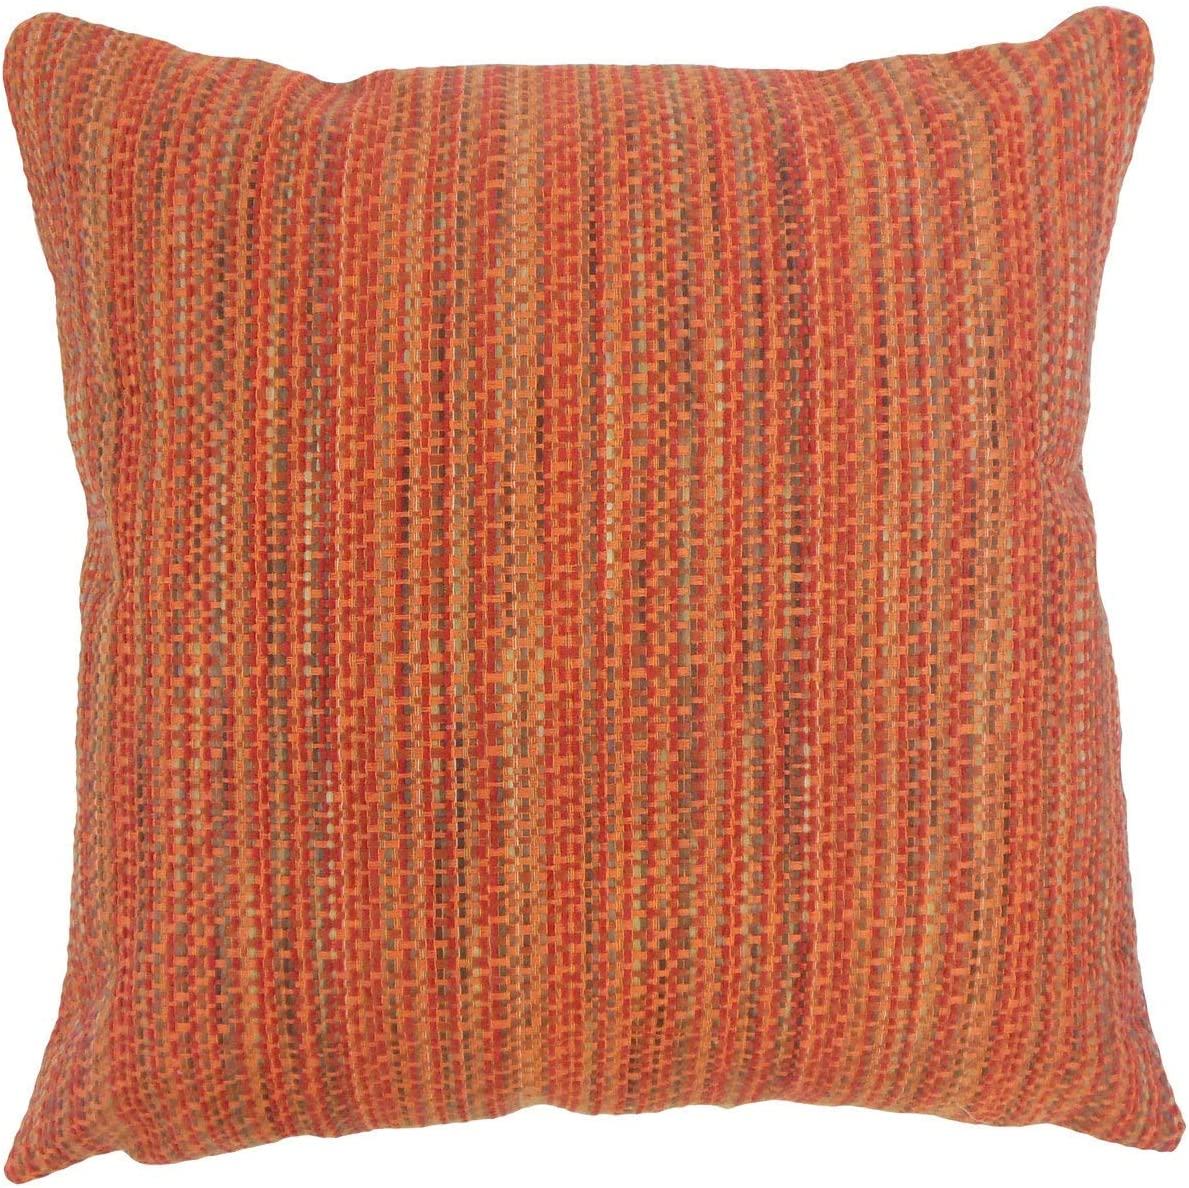 free Stripes 24-inch Feather Throw Pillow Stripe Finally popular brand Synthetic Fib Orange